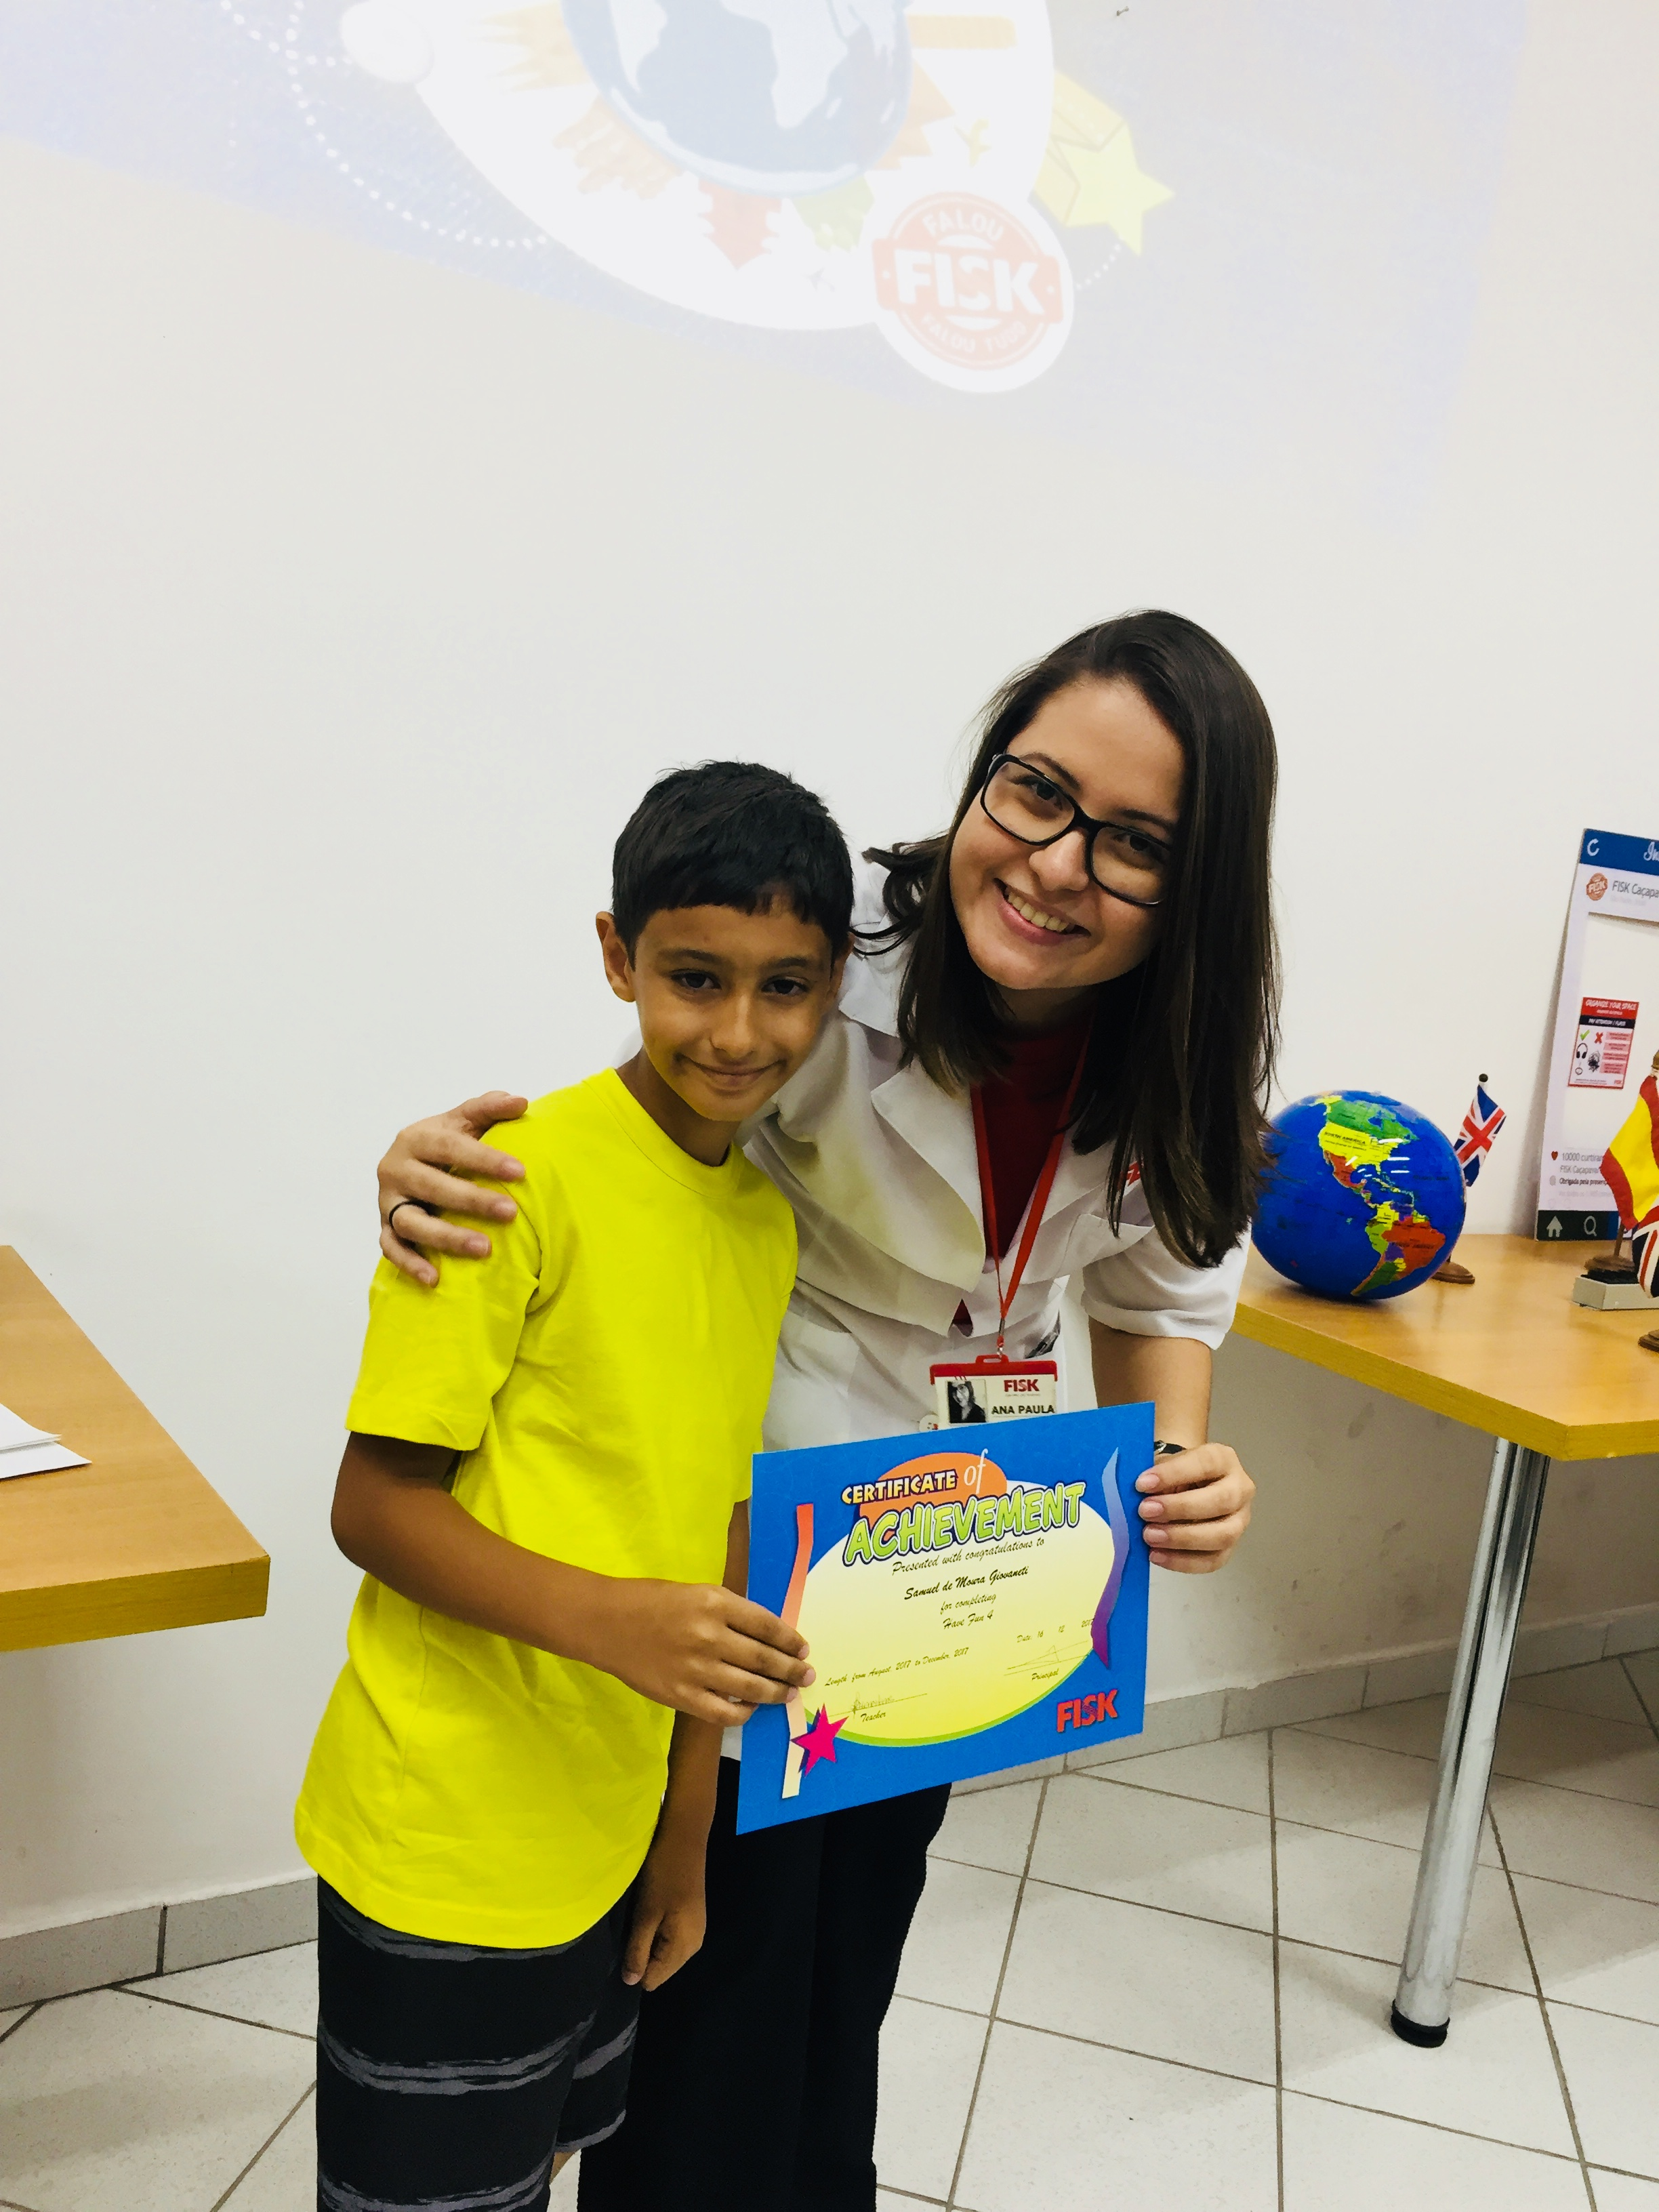 Fisk Taubaté (Centro)/SP - Formatura Kids